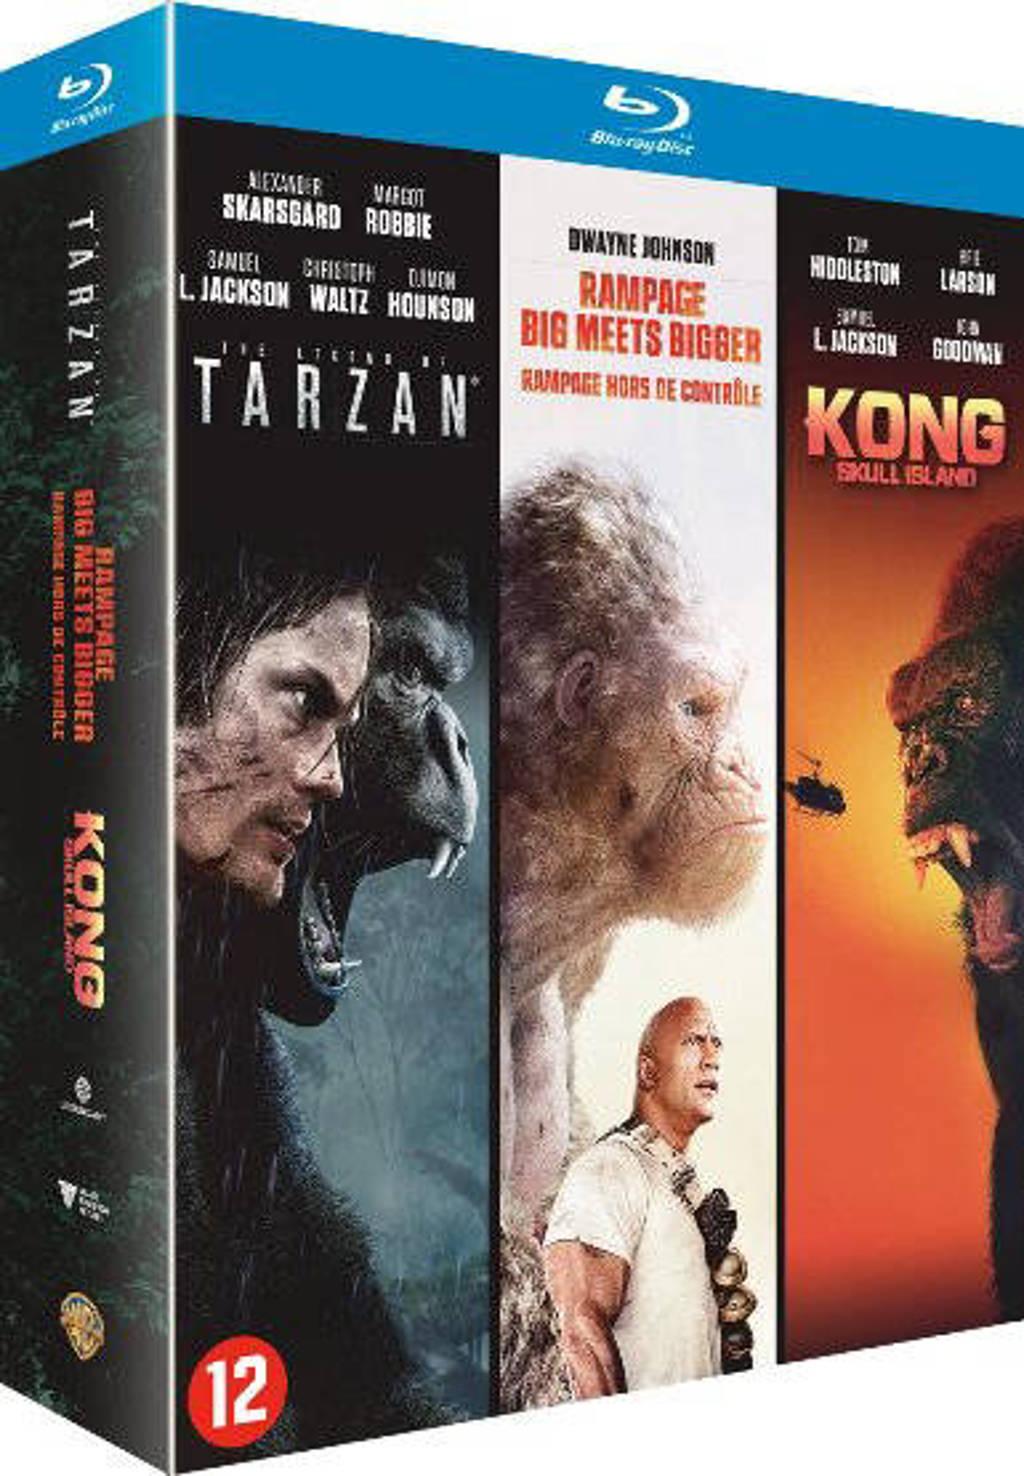 Giant jungle box (Blu-ray)